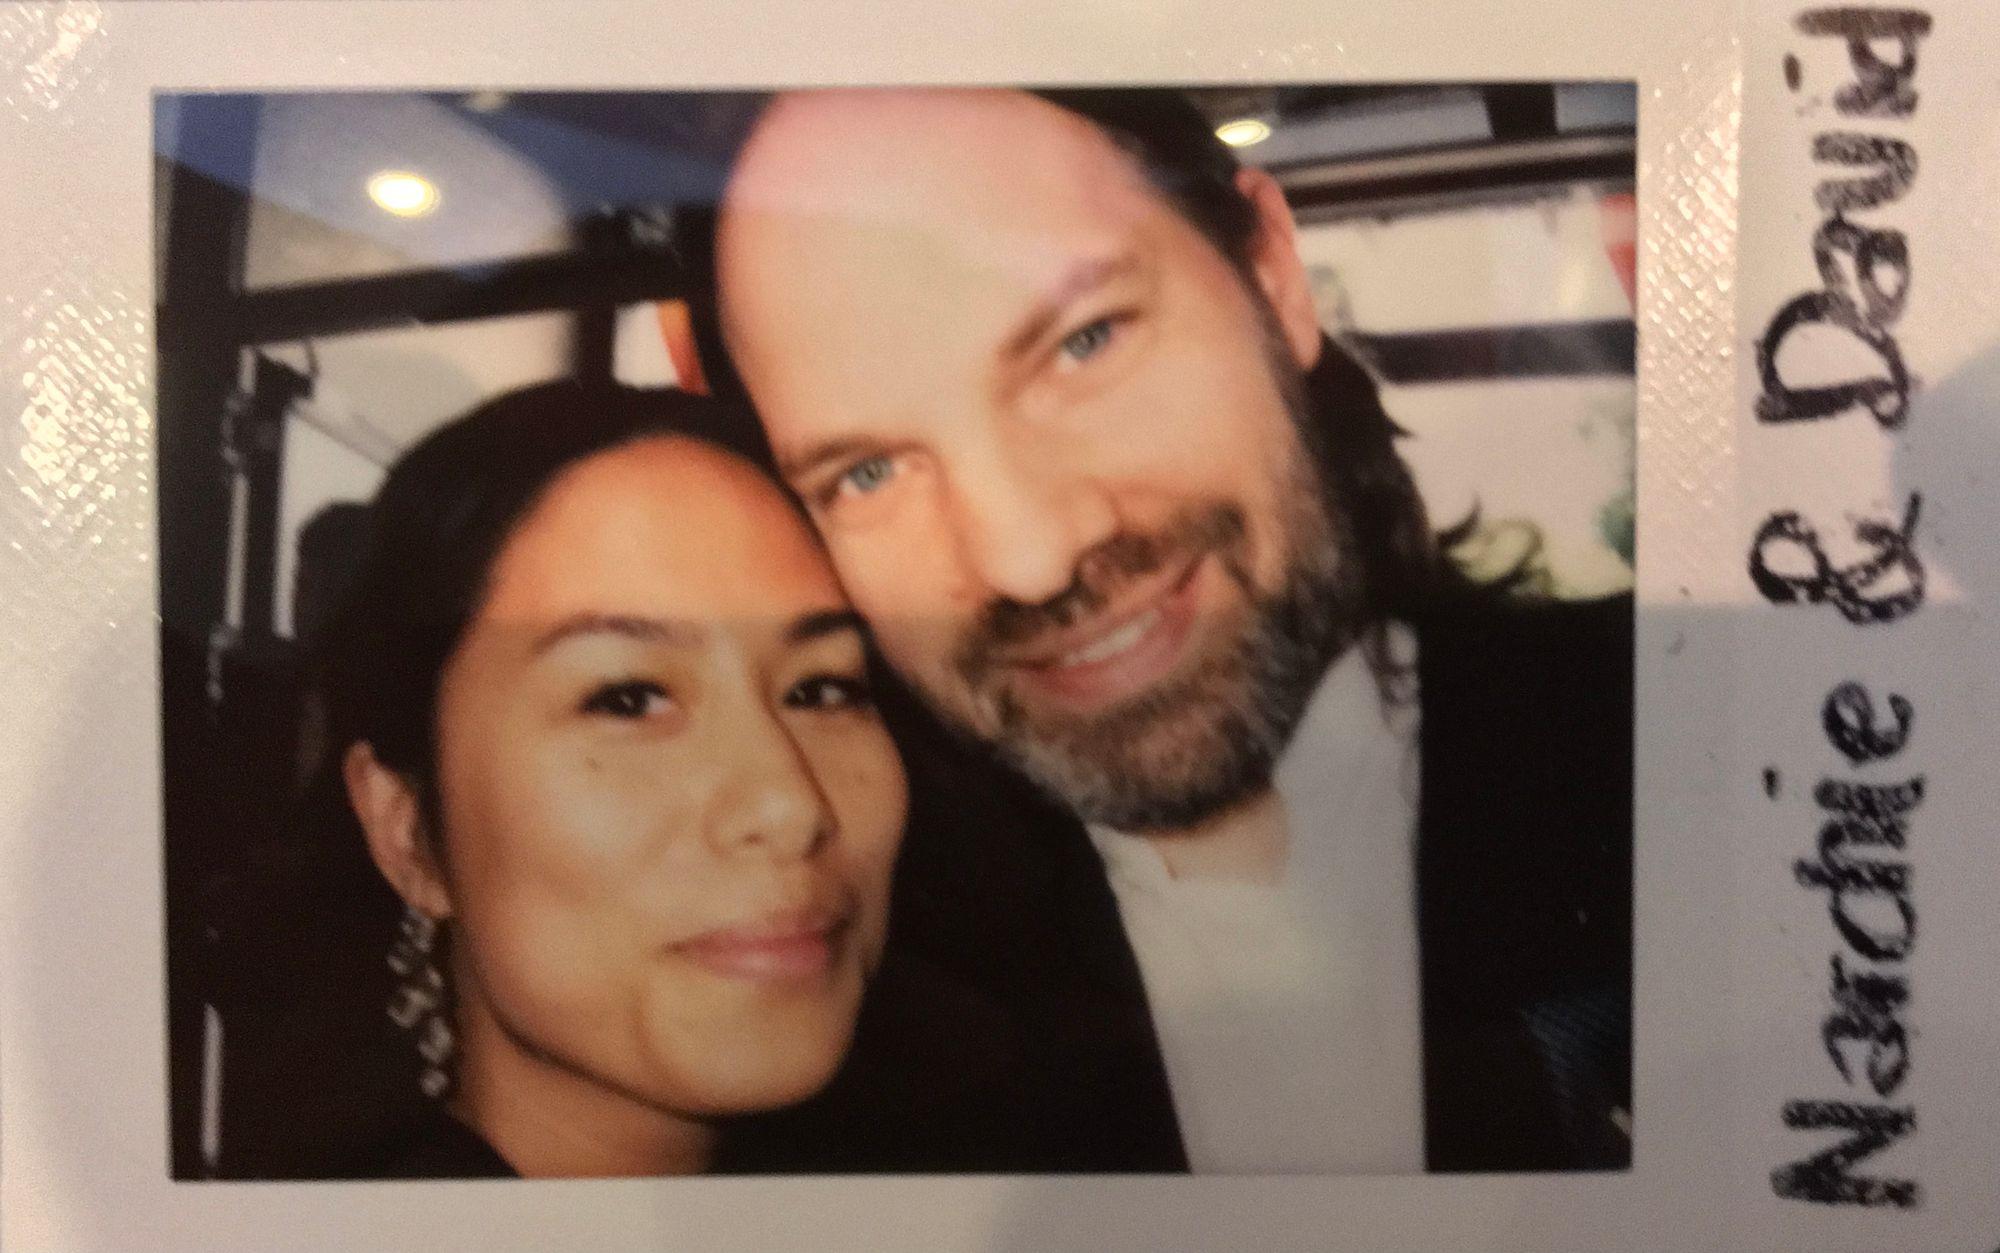 Polaroid photo of us at a wedding.